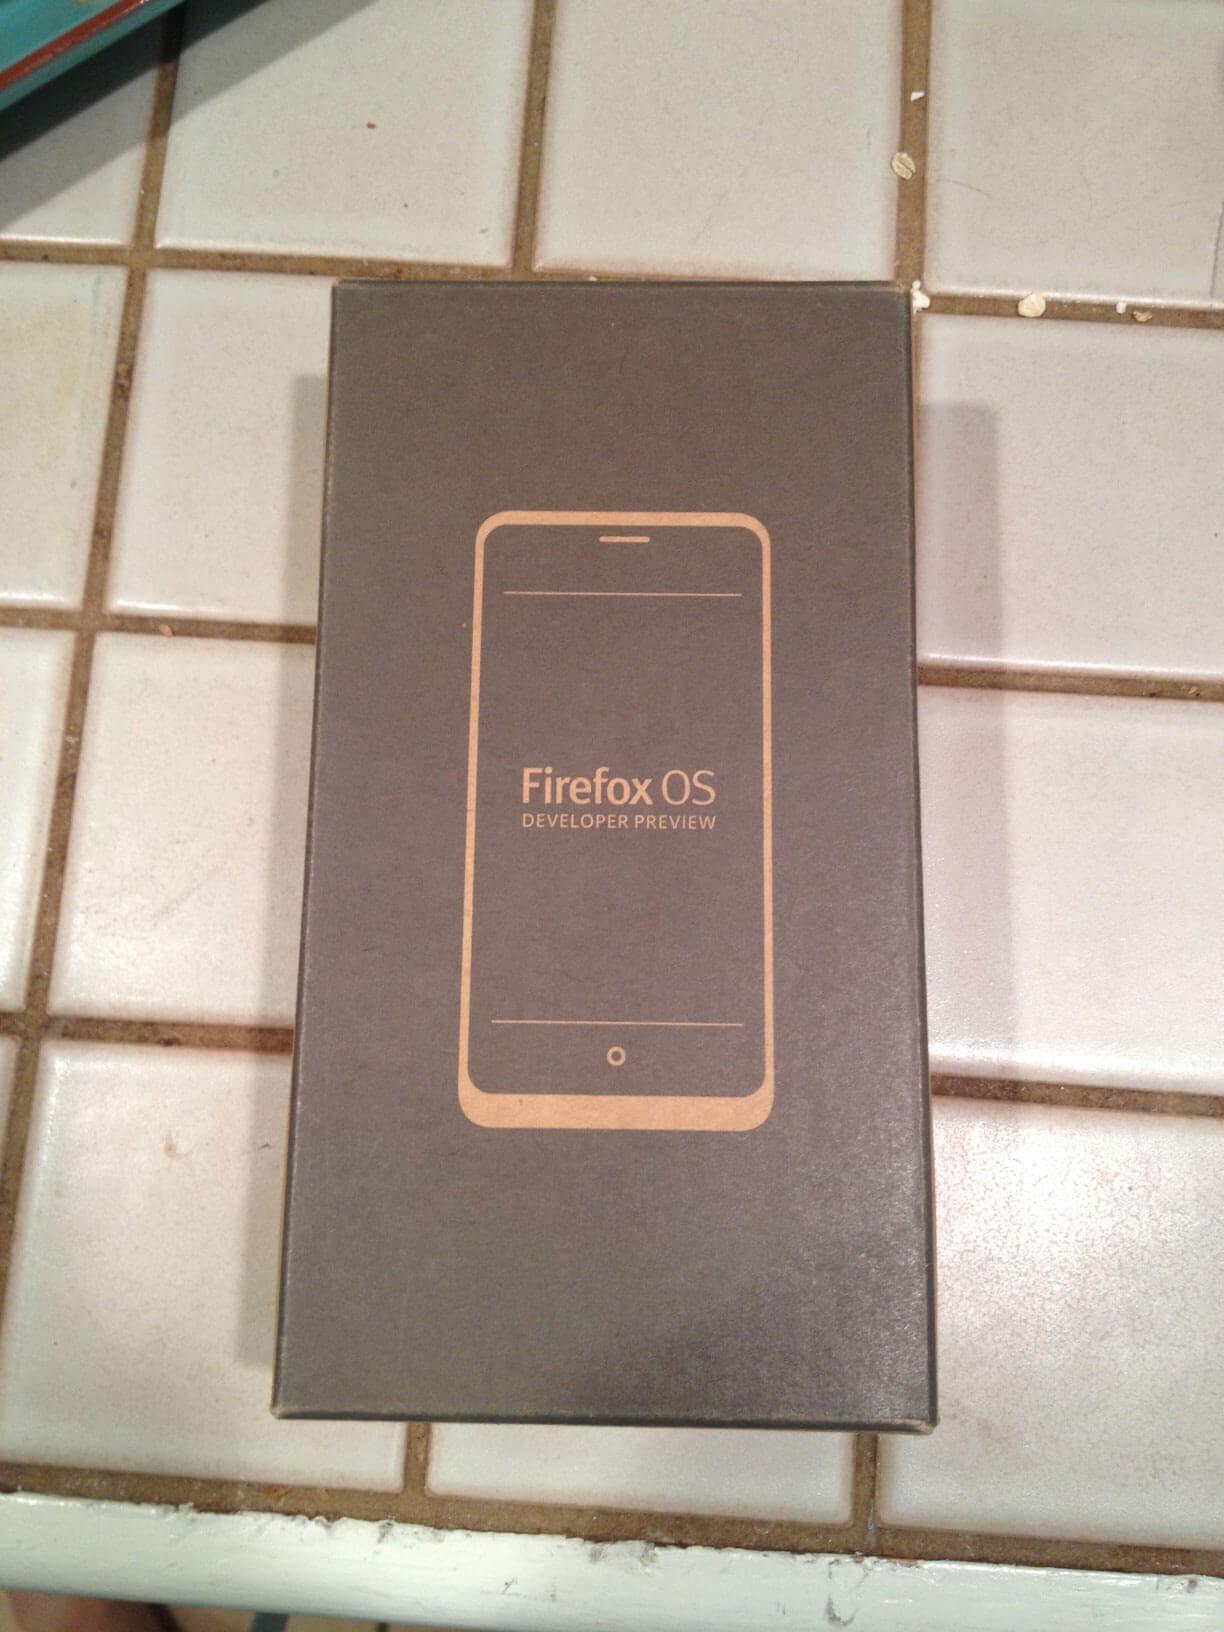 Geeksphone Peak Firefox OS Phone 1